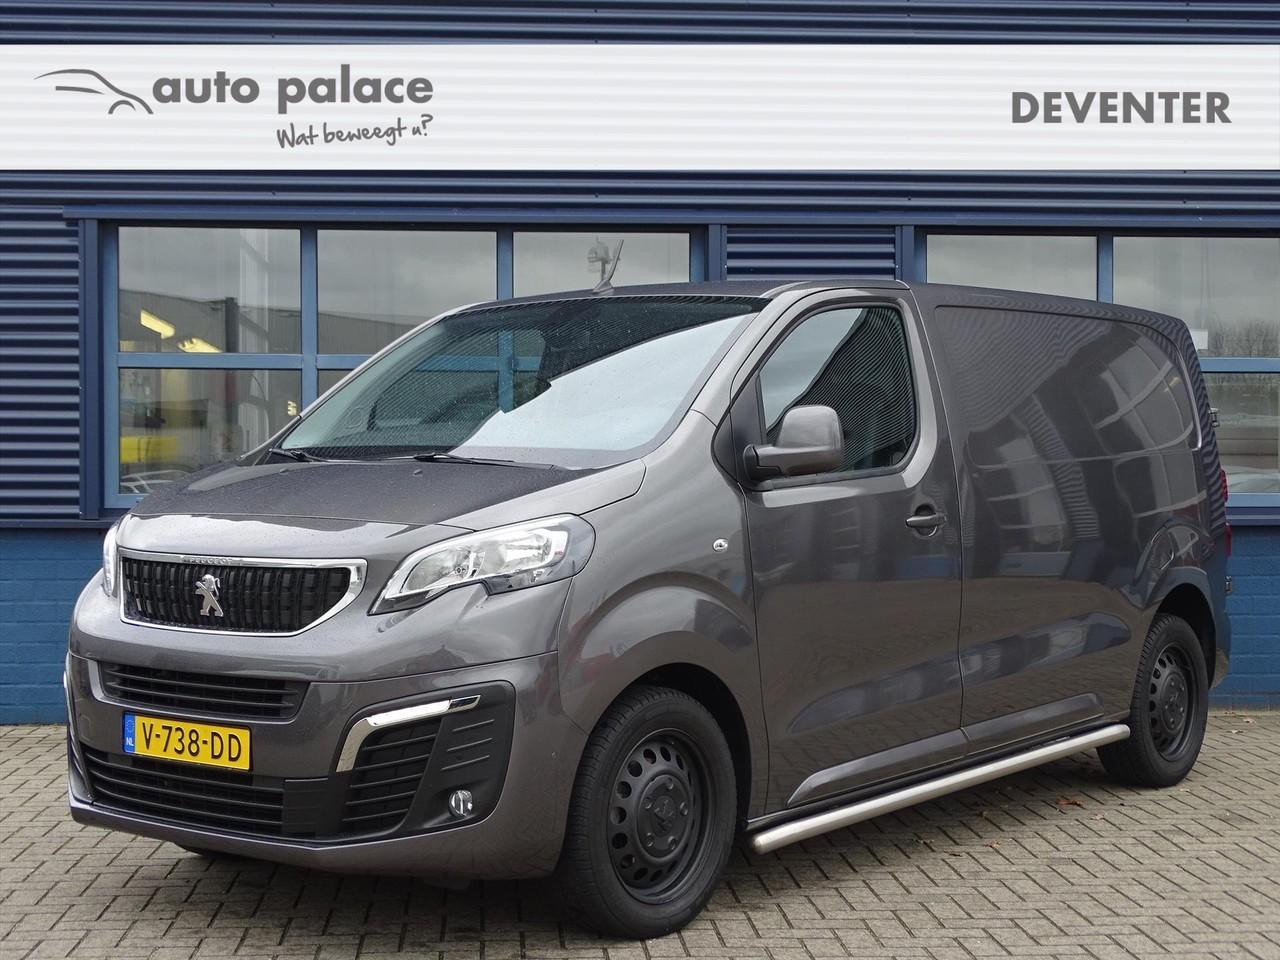 Peugeot Expert 2.0 hdi 150pk club, navigatie, betimmering, grip control